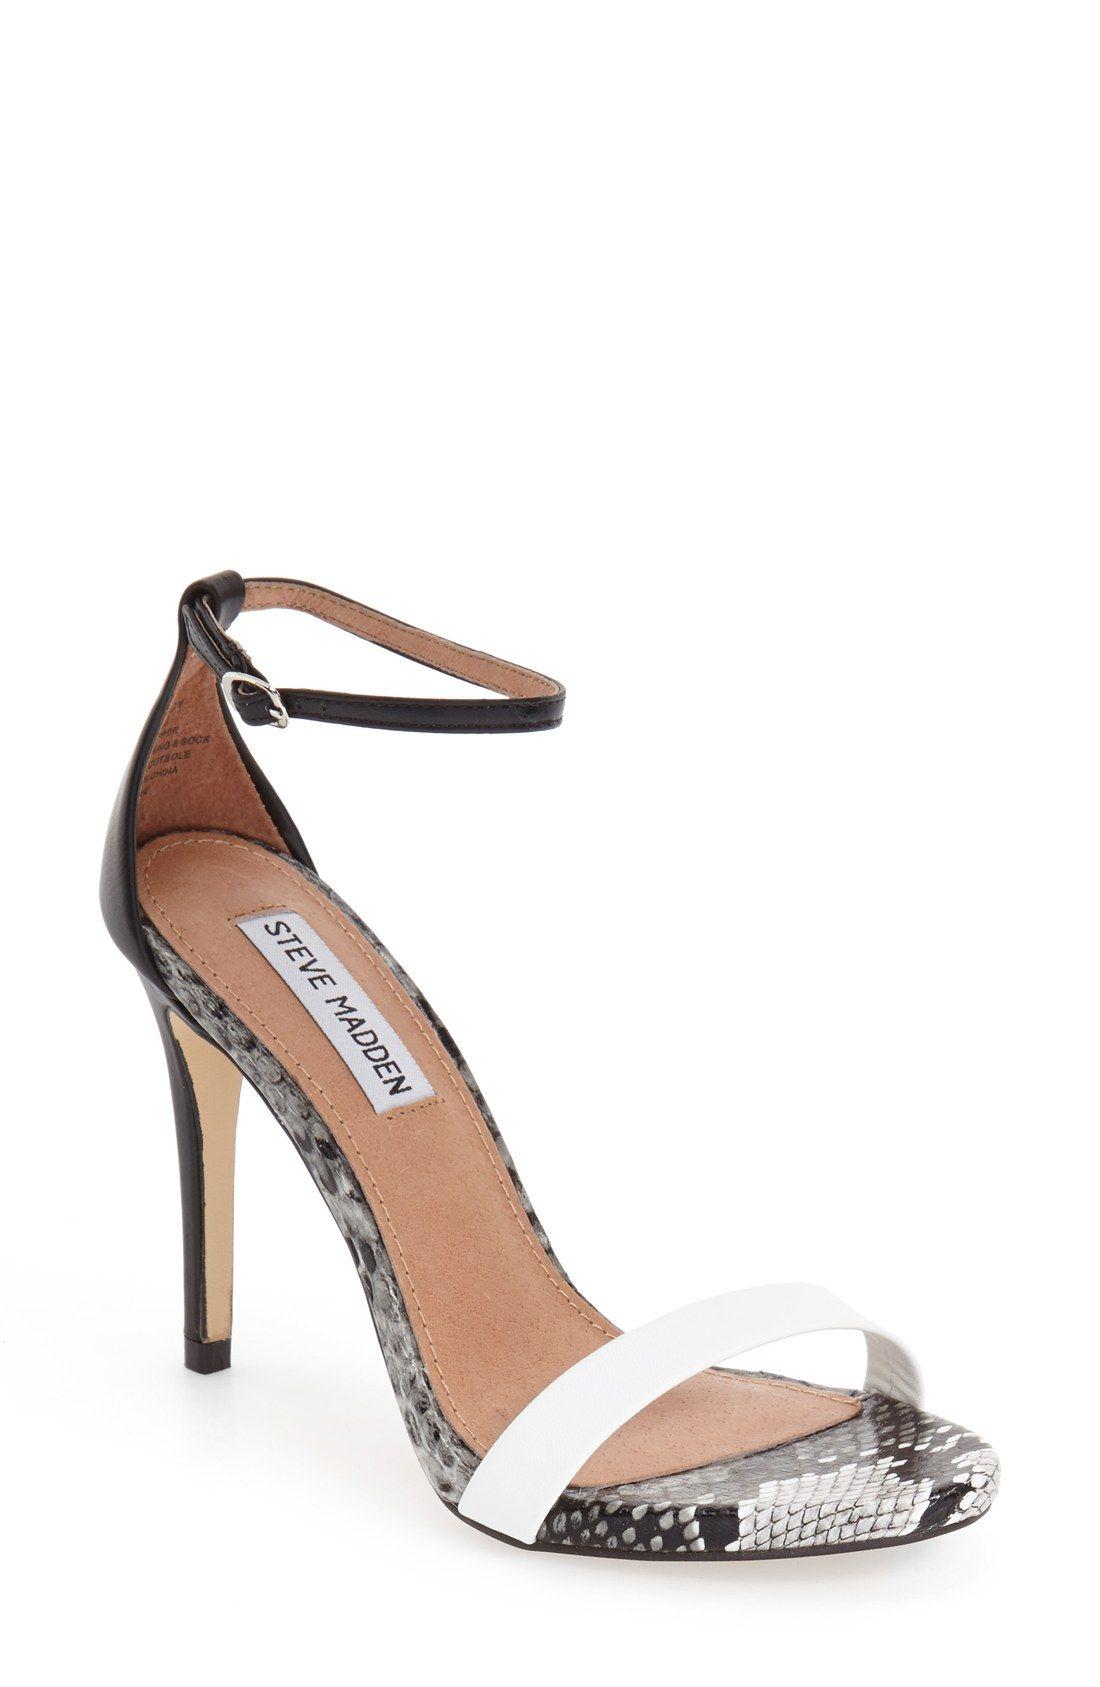 ae0769fa4e5 black and white Steve Madden high heels.  Stecy  Sandal (Women)